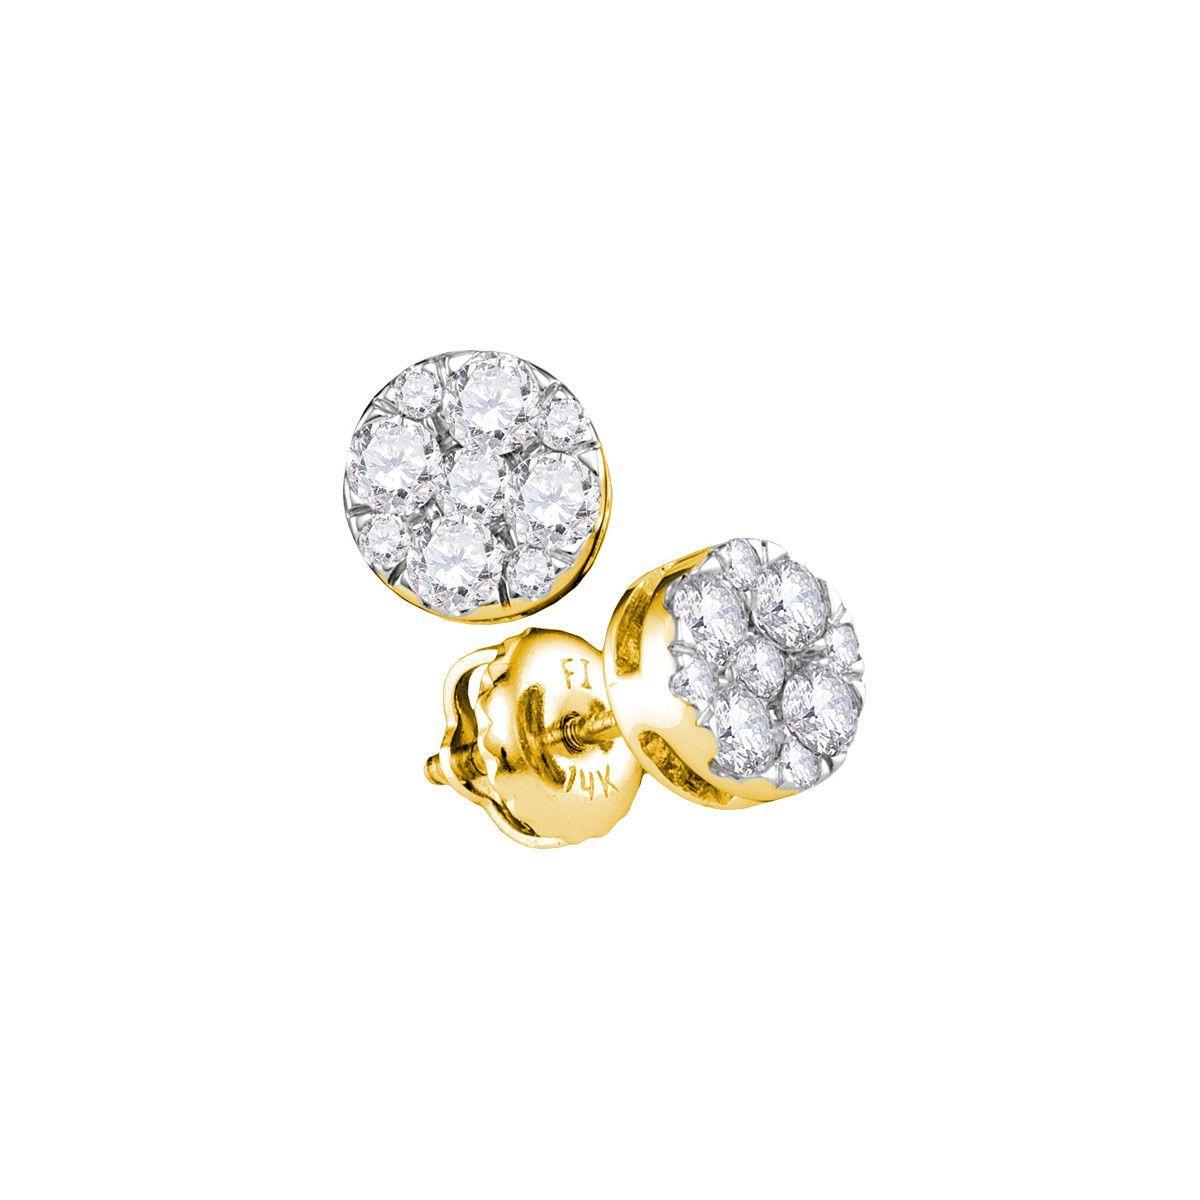 14kt Yellow Gold Womens Round Diamond Flower Cluster Stud Earrings 1/2 Cttw 107406